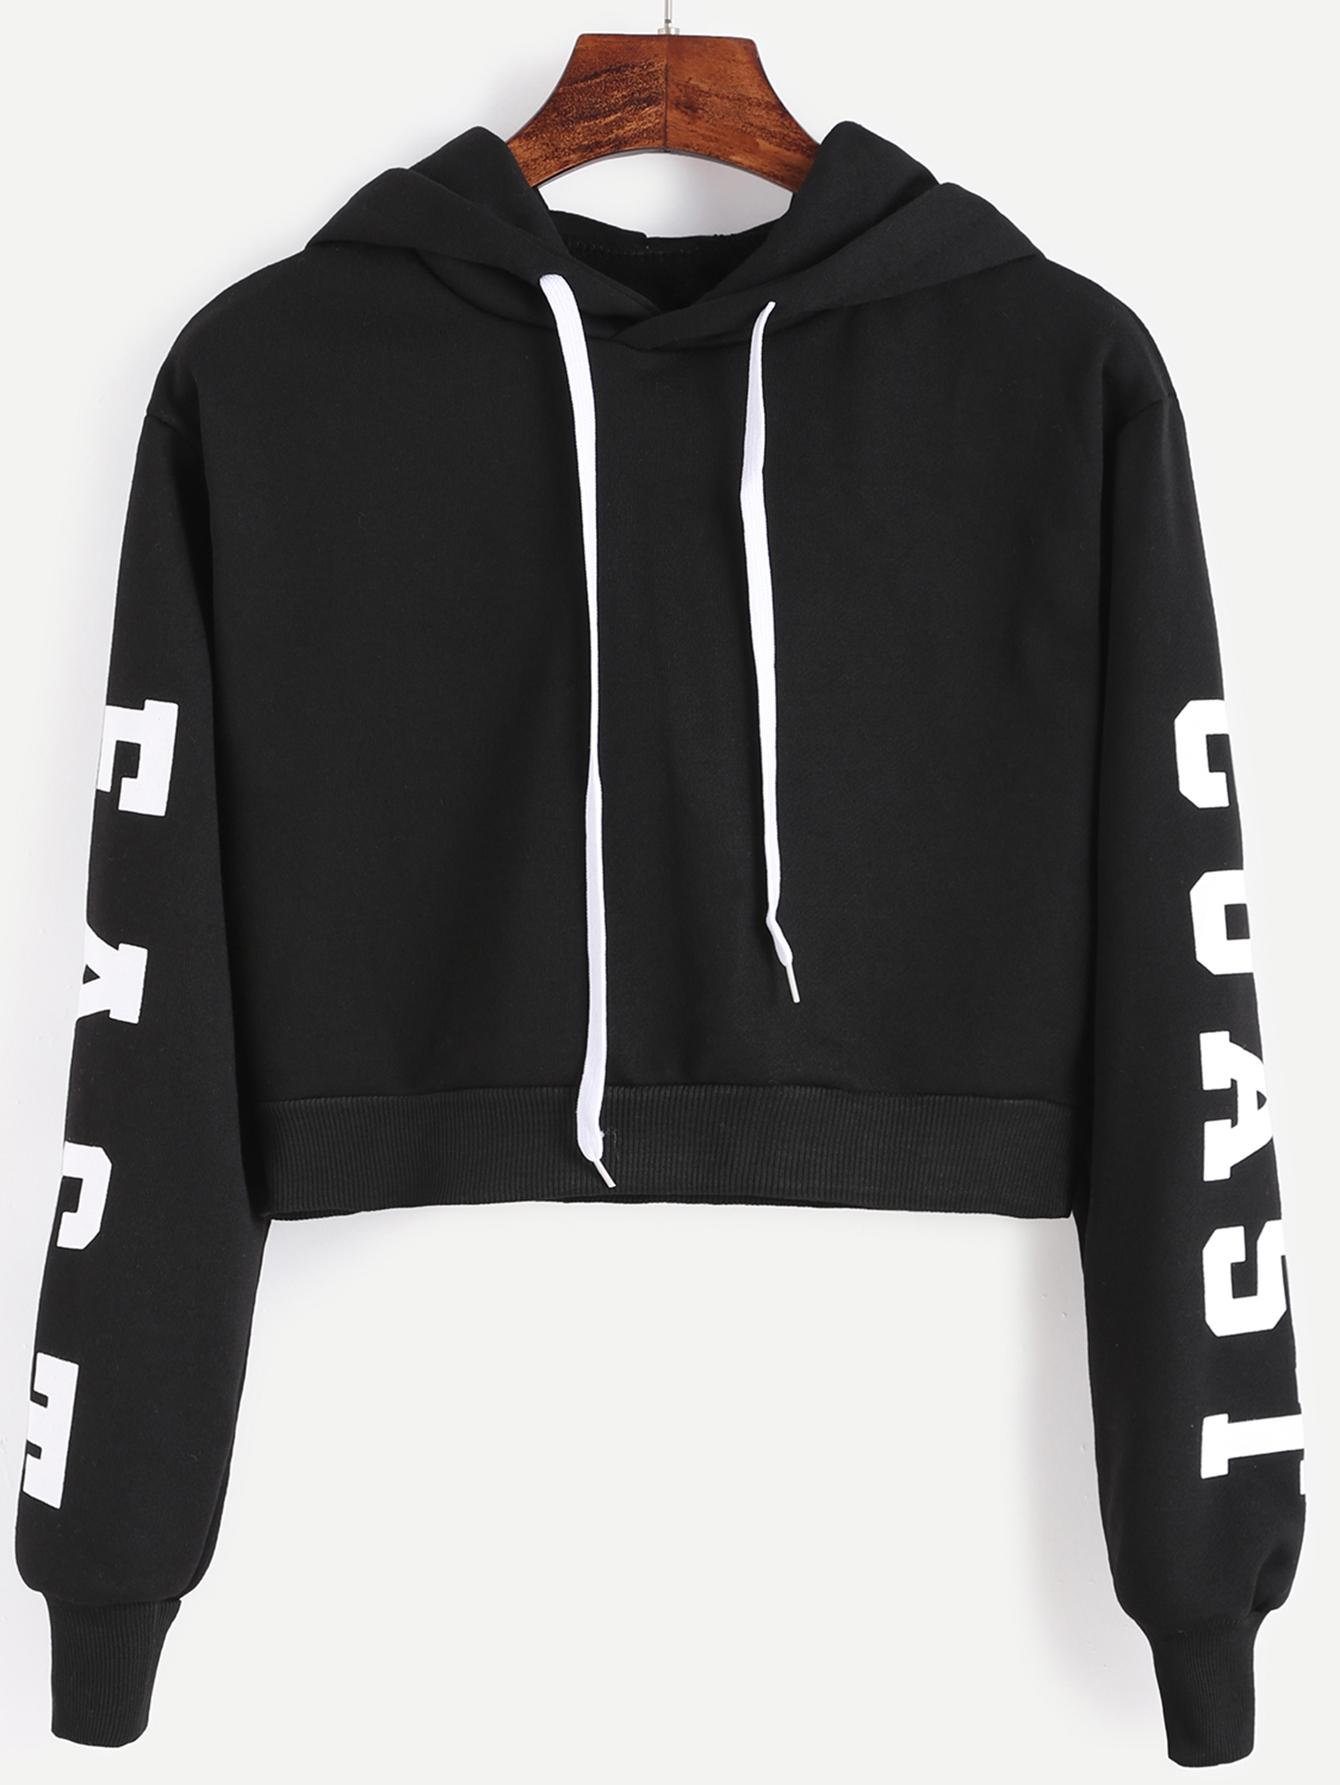 7d5fbe6575f Black Hooded Letters Print Crop Sweatshirt -SheIn(Sheinside)